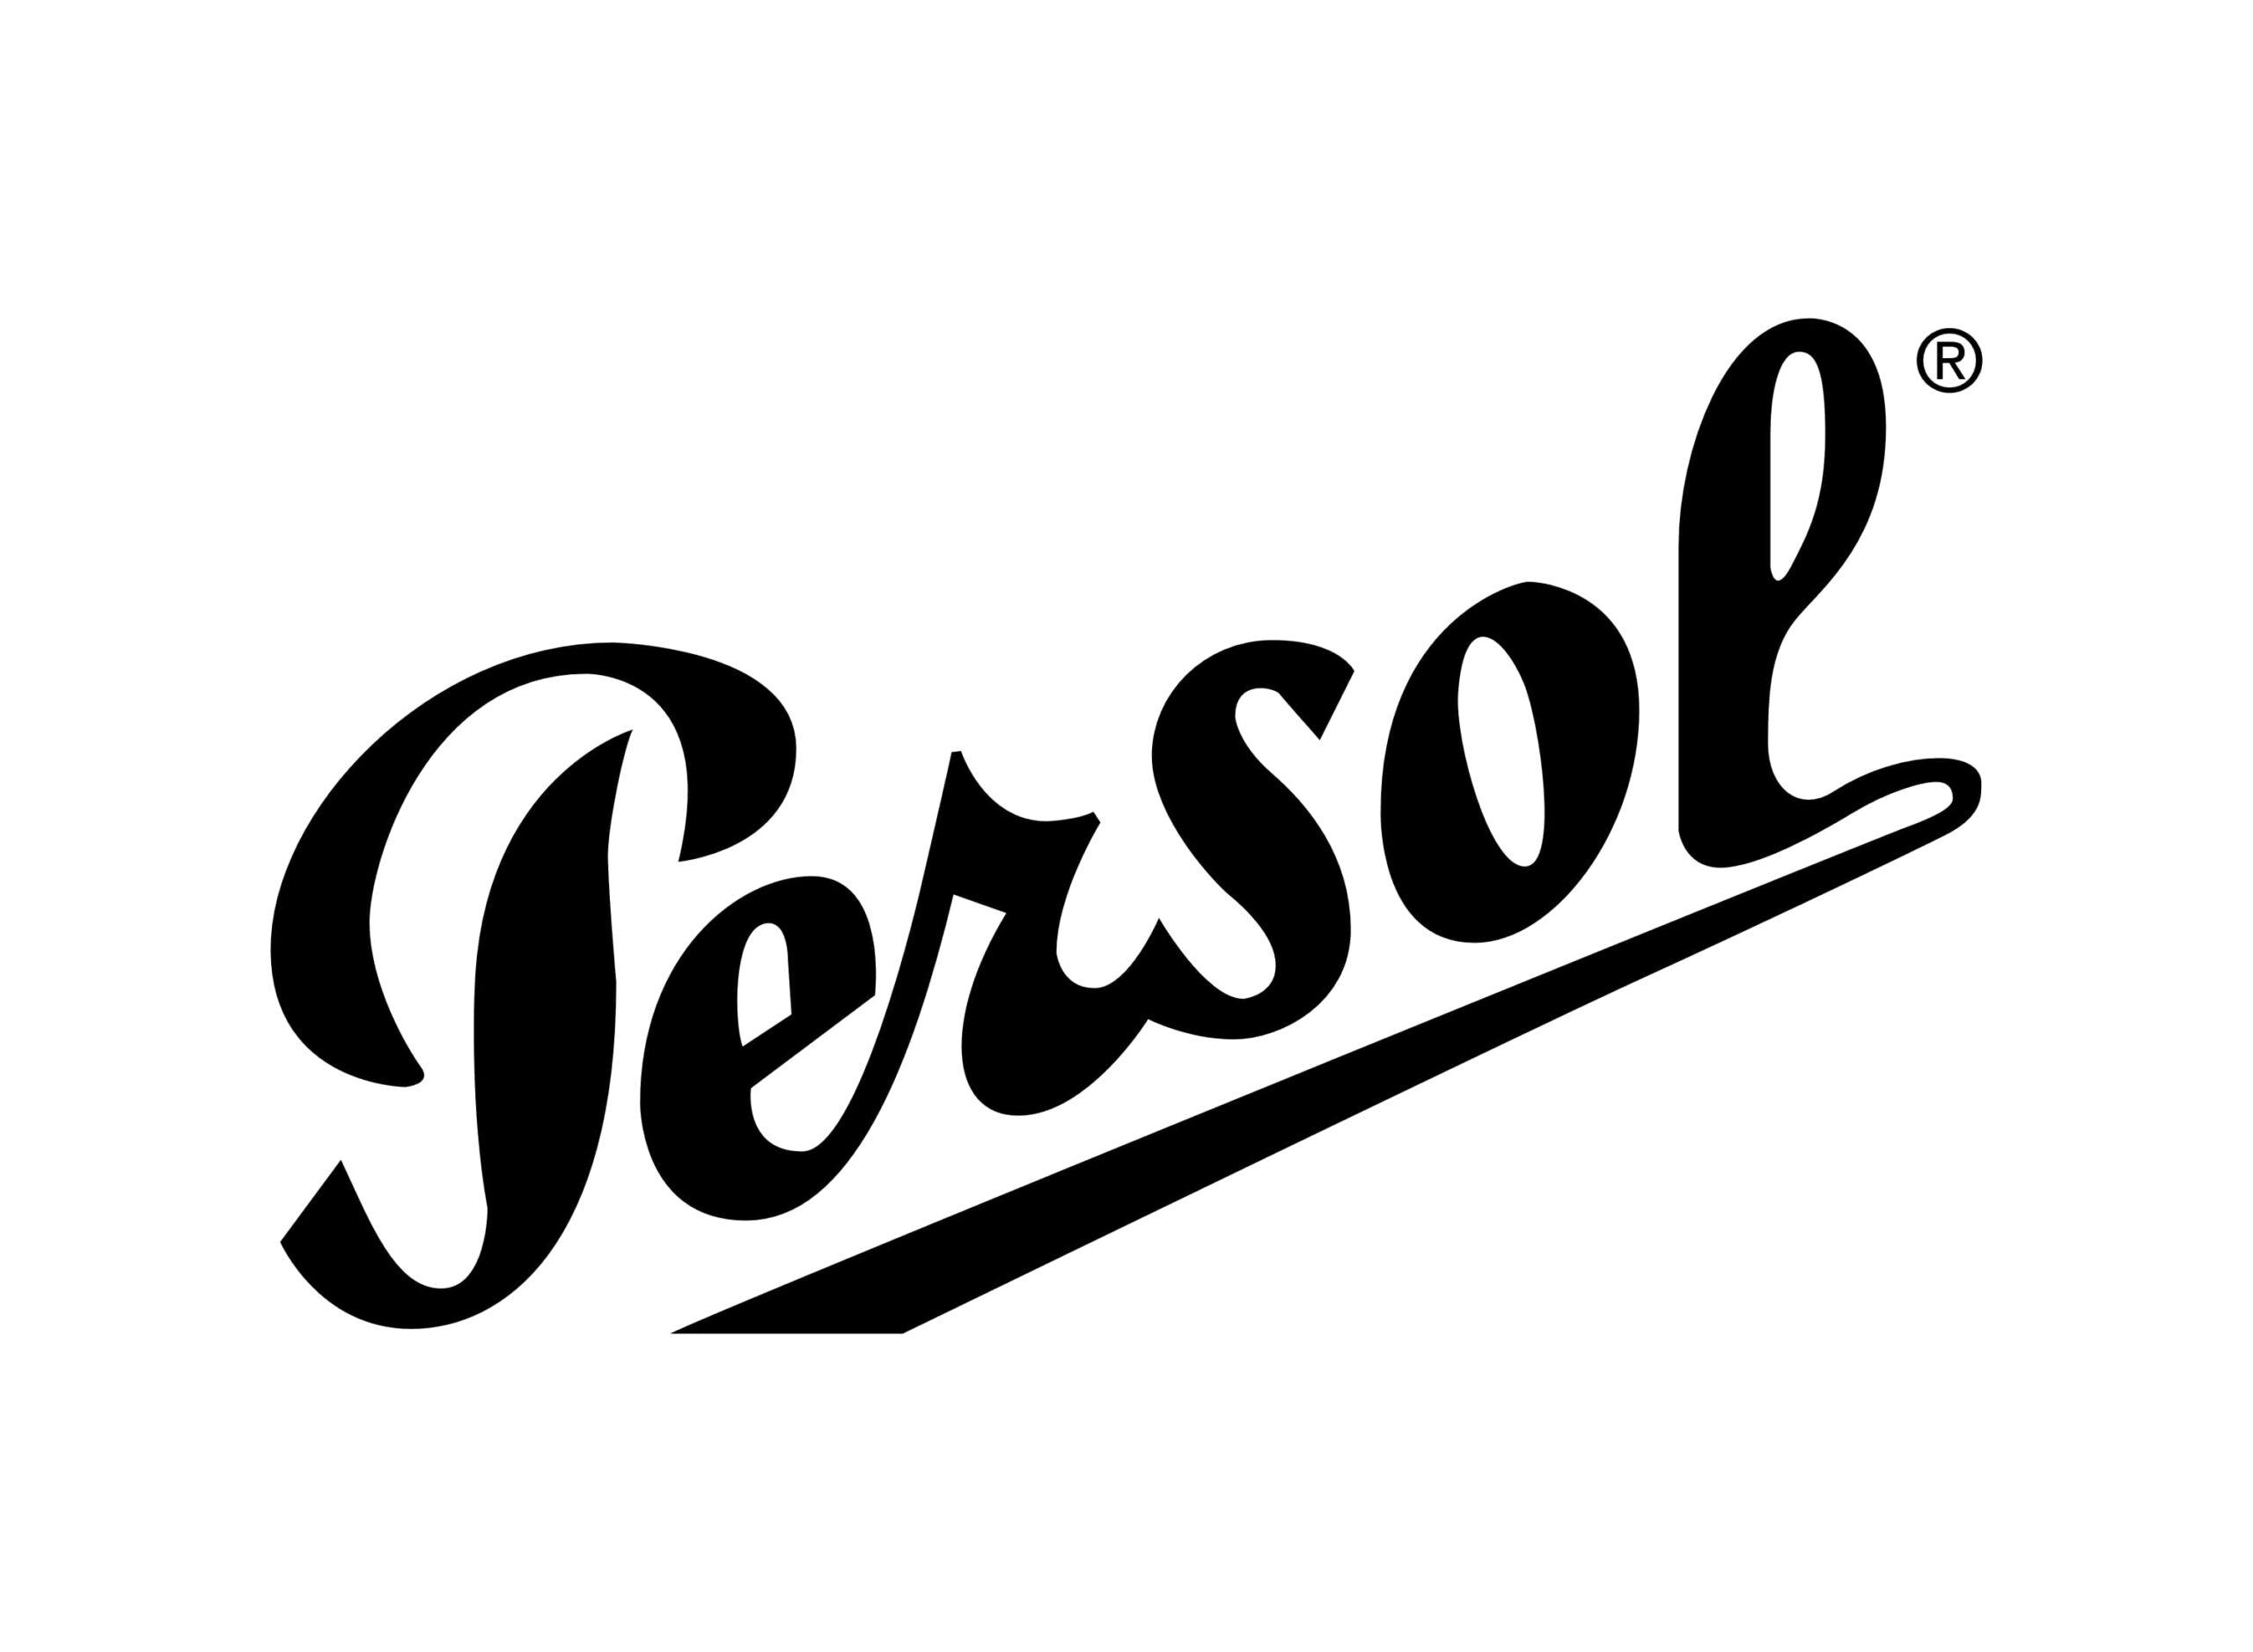 https://mysunrays.com/wp-content/uploads/2021/09/Persol-logo-scaled.jpg